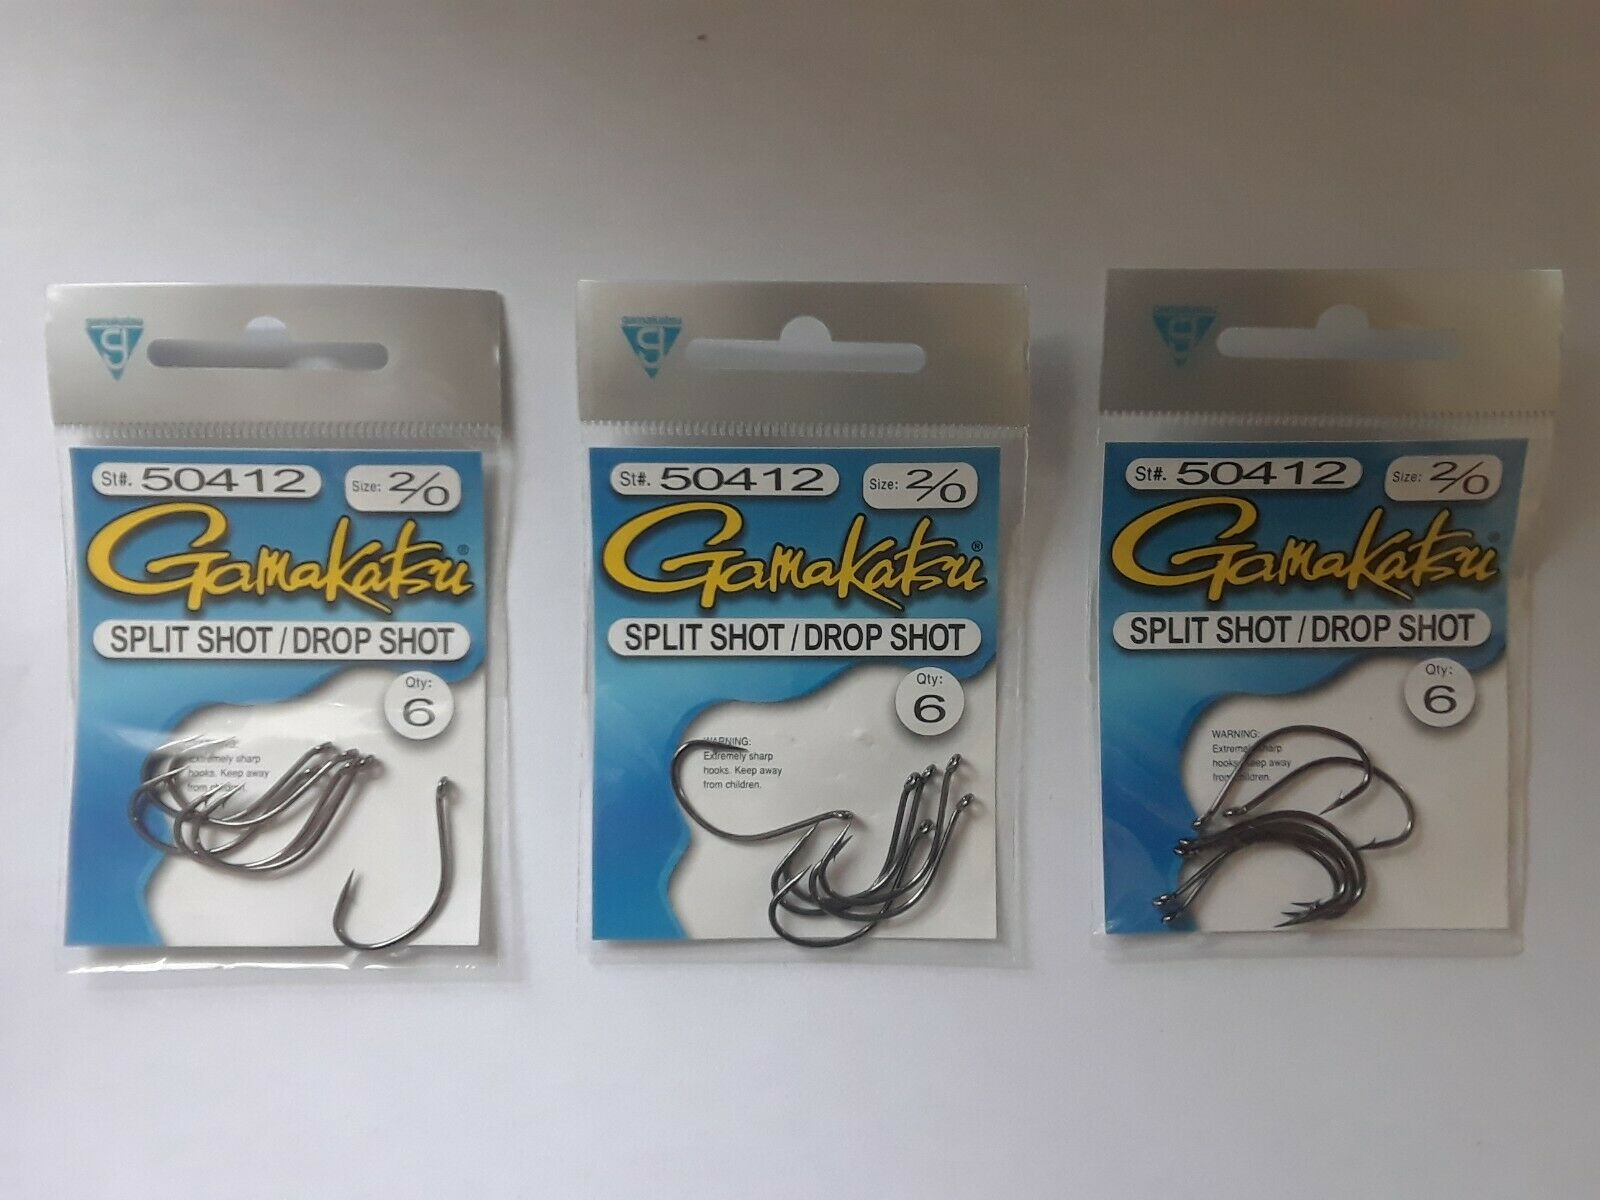 Gamakatsu 220/20 Split Shot/drop Shot 52041220 Fishing Hooks for sale ...